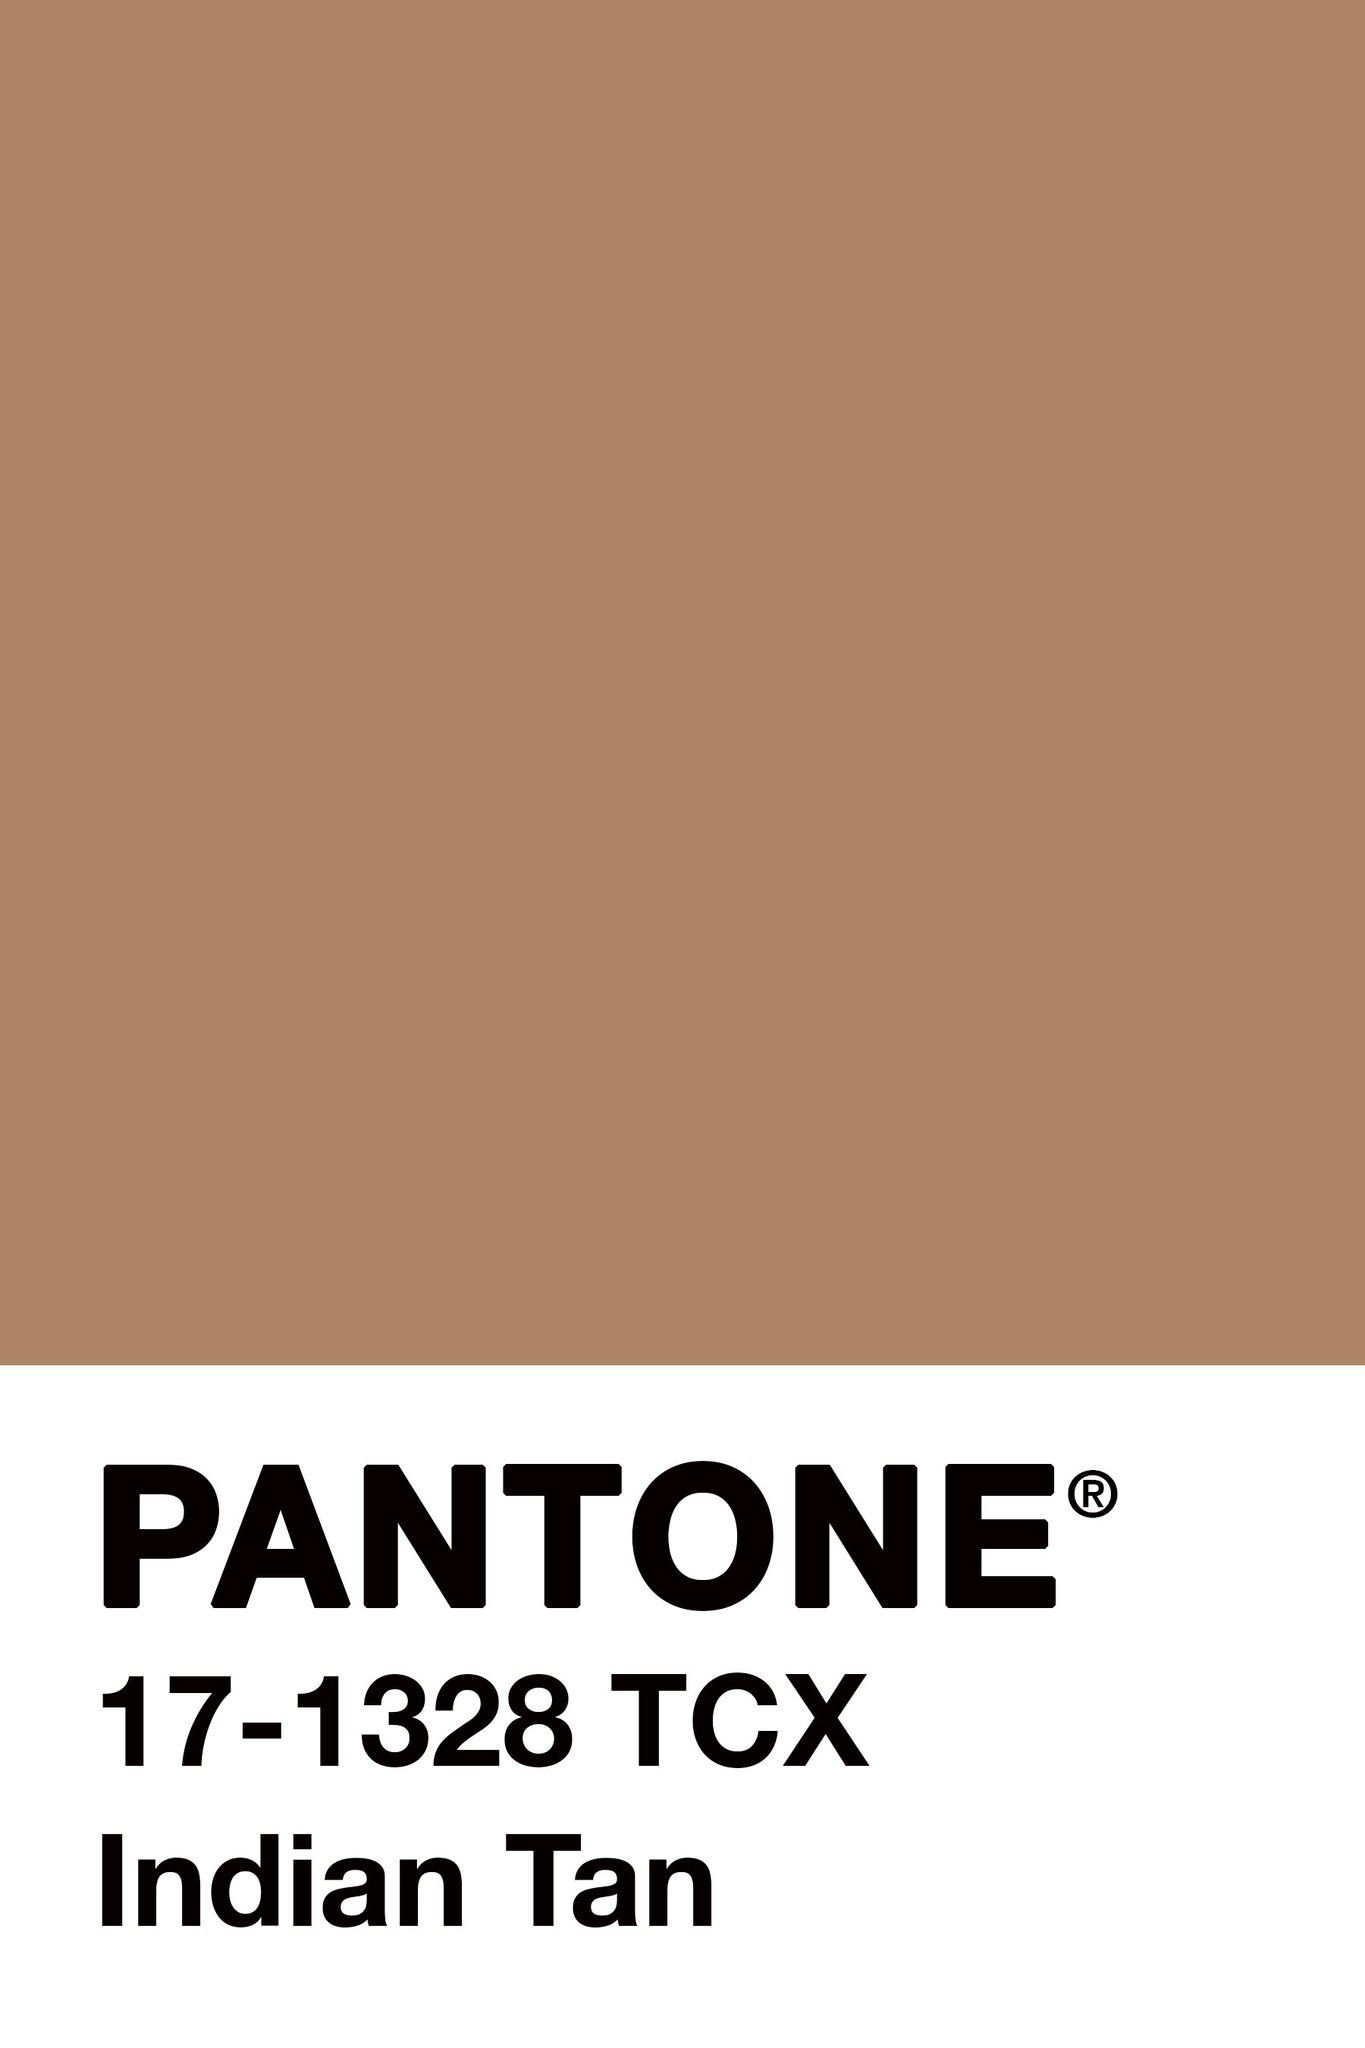 H N N H On Twitter Pantone Pantone Colour Palettes Pantone Swatches